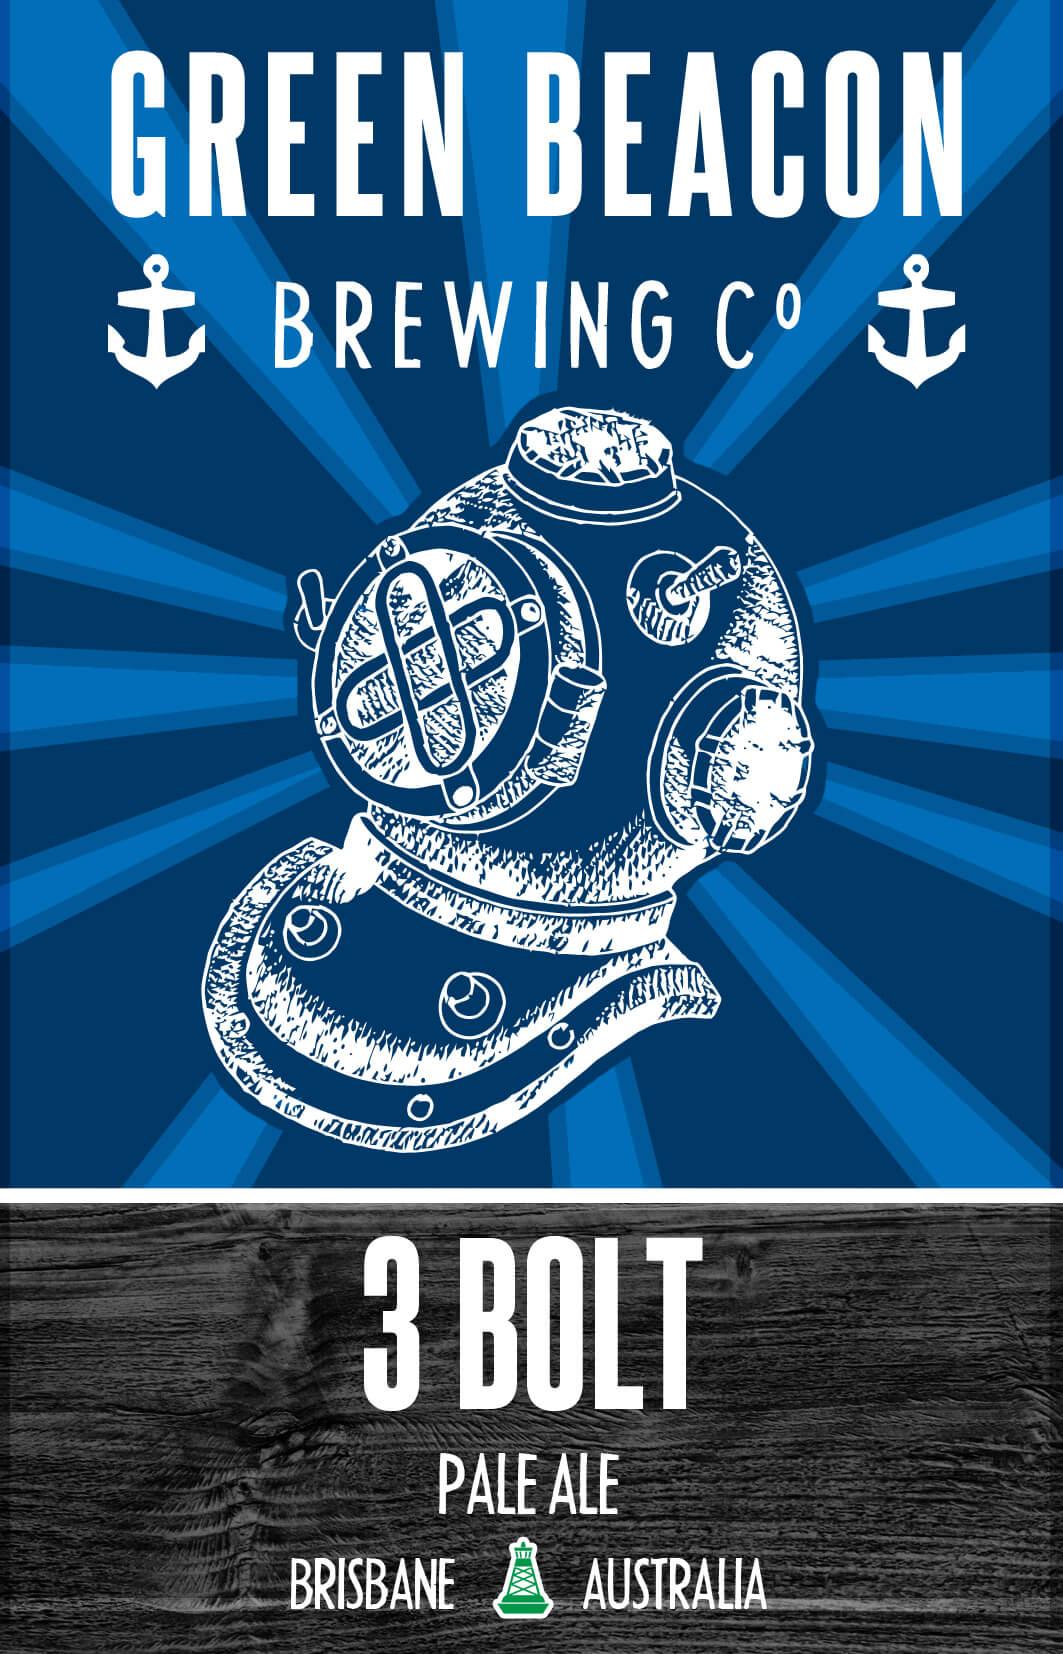 green-beacon-brewing-co-3-bolt-pale (1).jpg